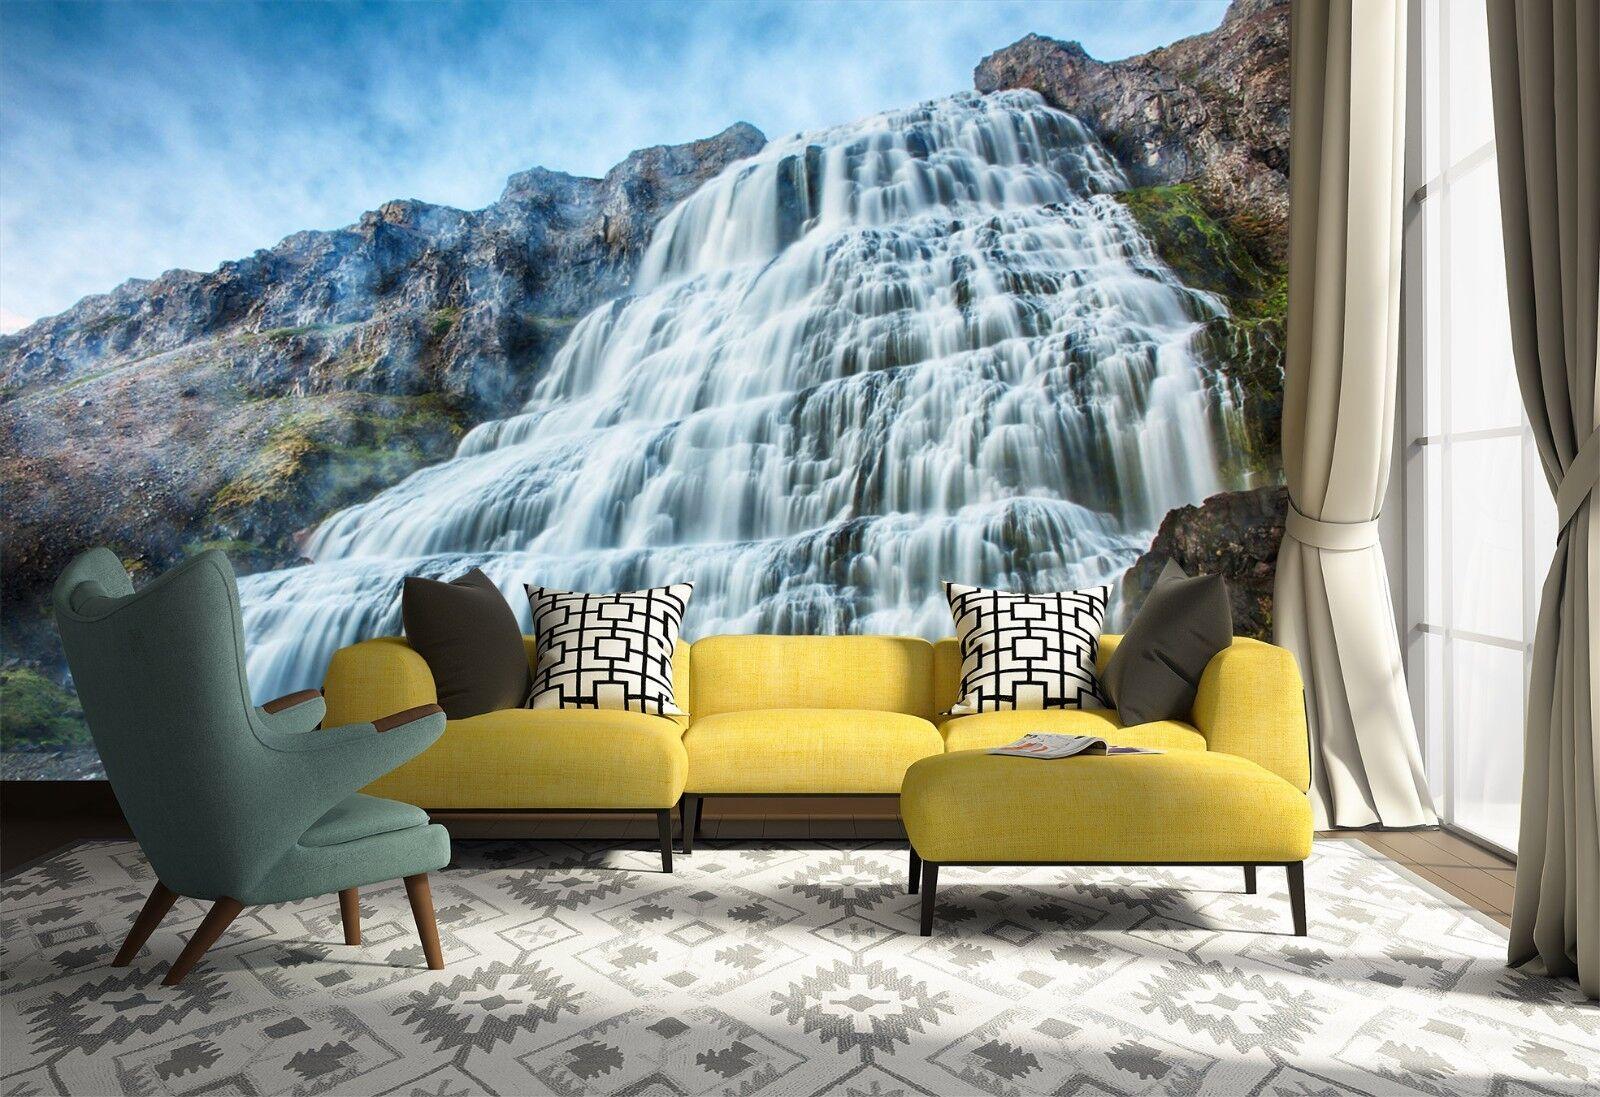 3D Wasserfall 688 Tapete Tapeten Mauer Foto Familie Tapete Wandgemälde Summer